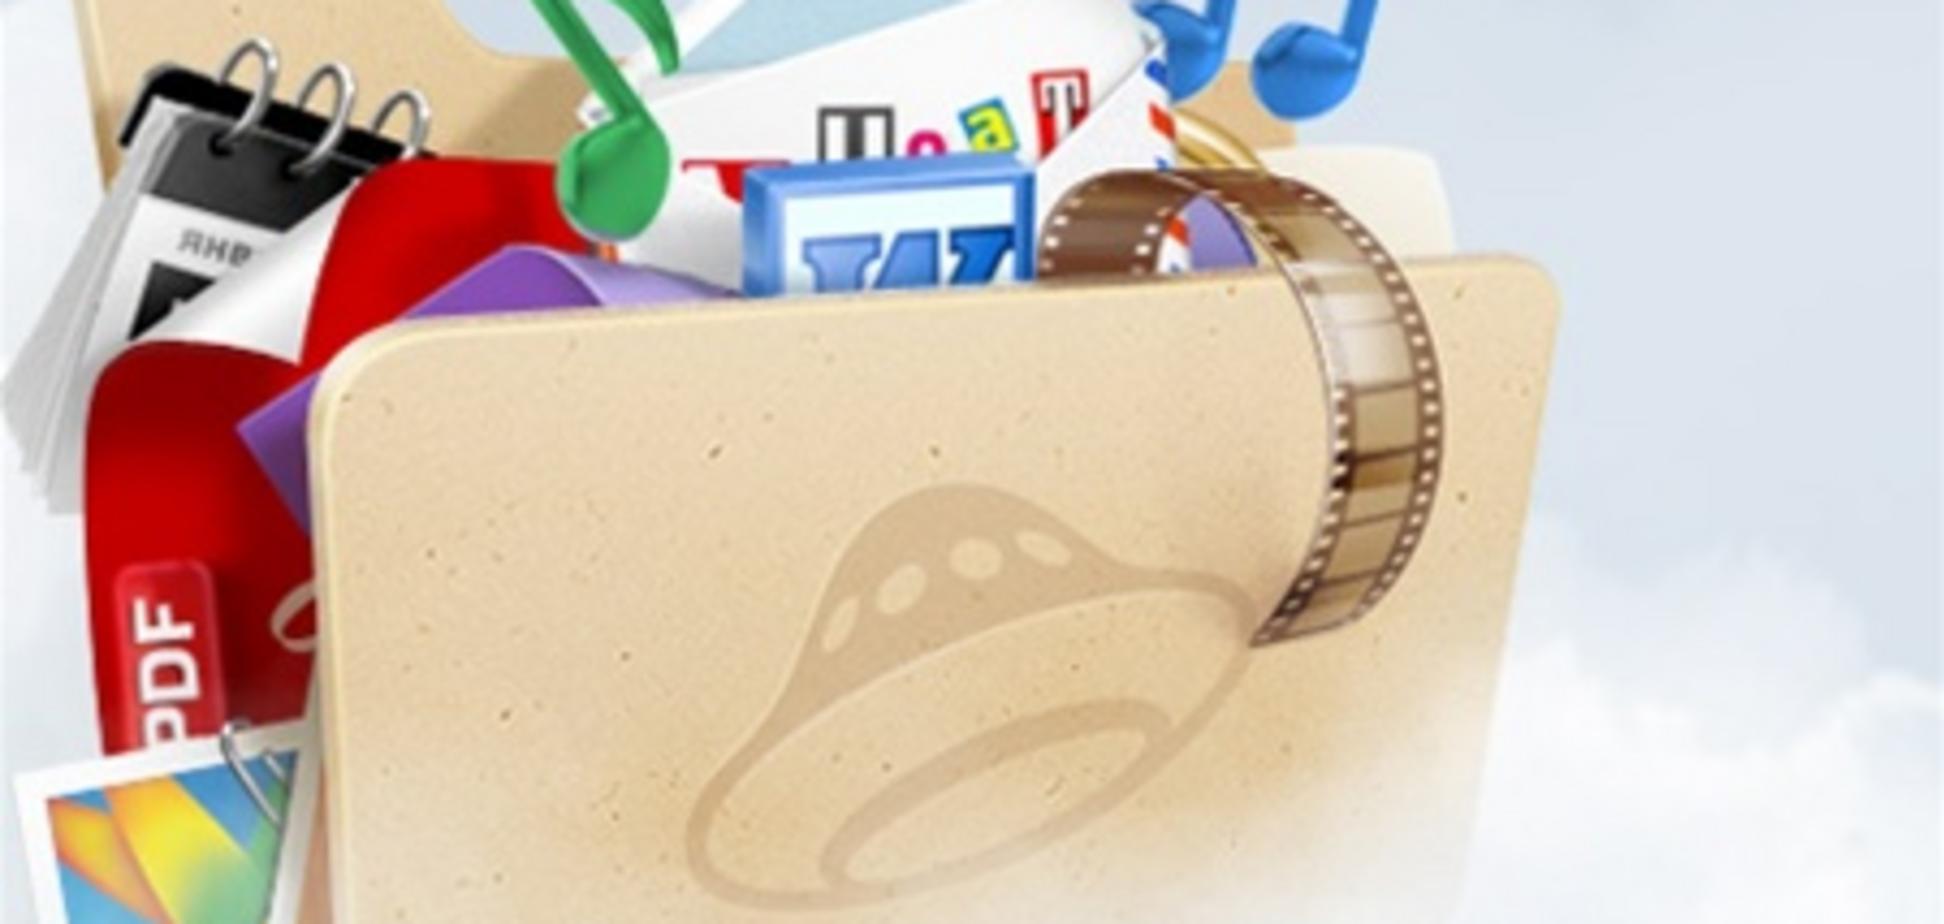 'Яндекс' запустил бесплатную интернет-флешку на 10 гигабайт. Фото